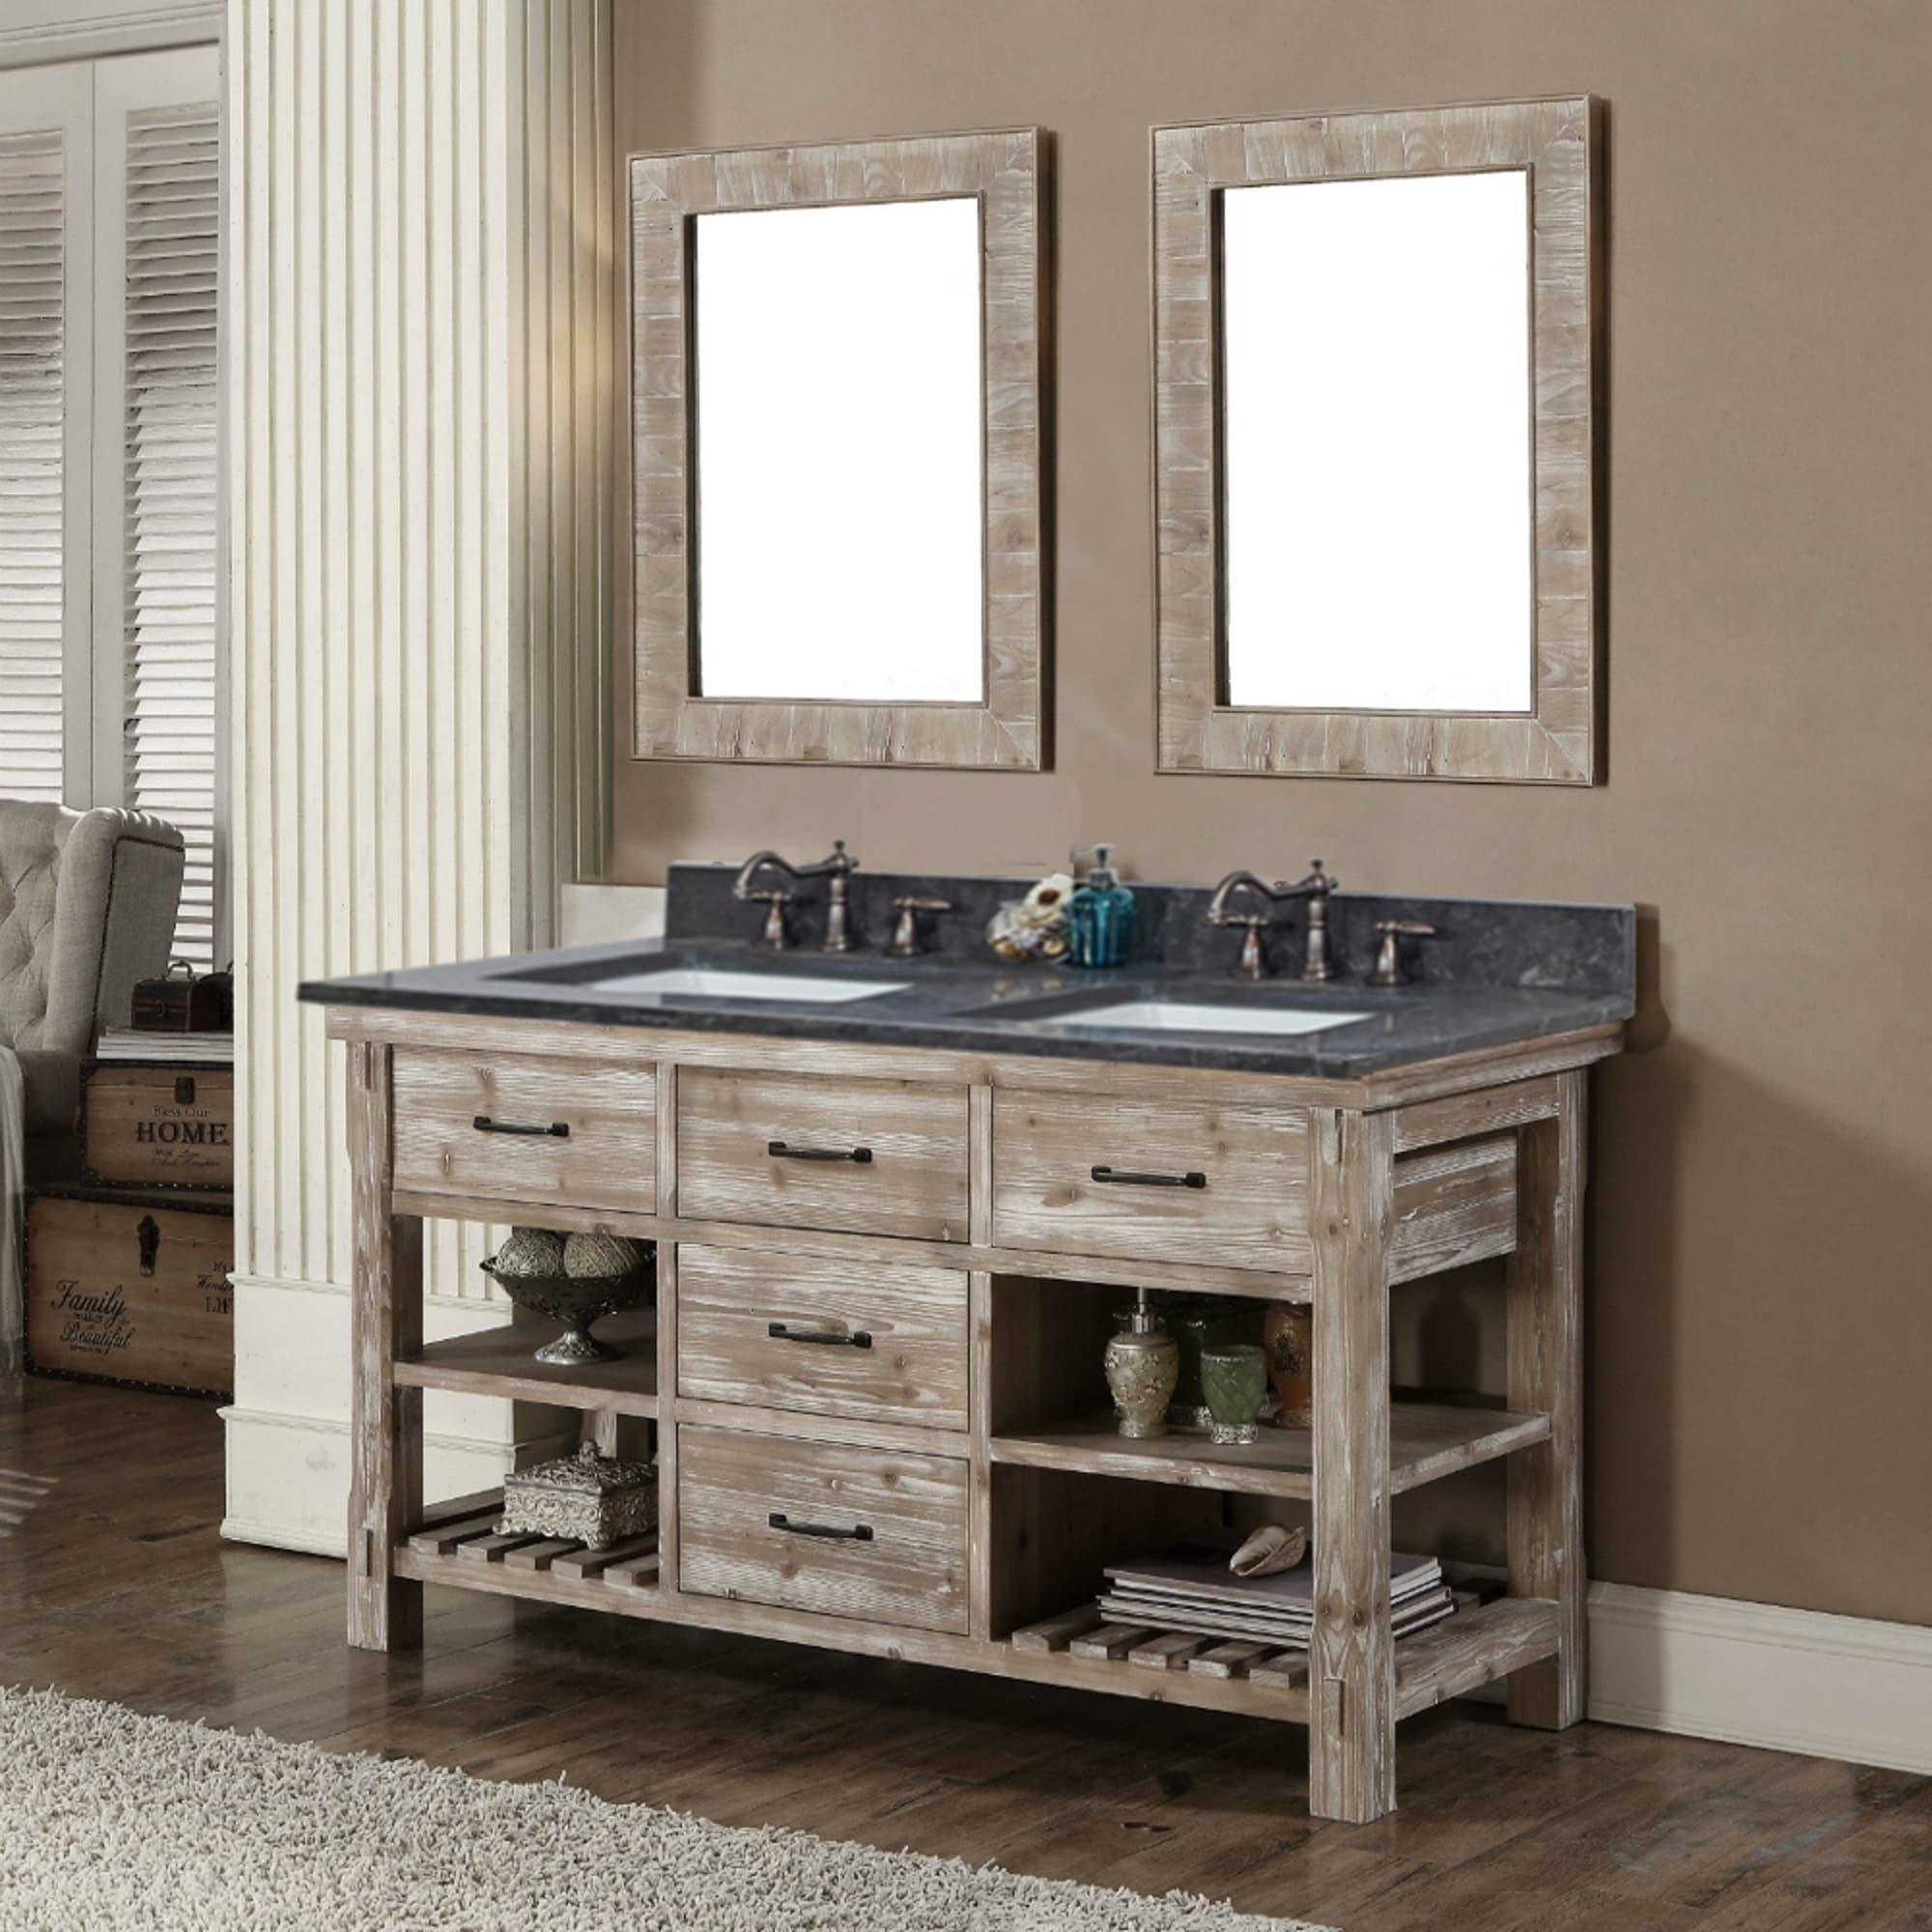 Rustic Style 60 Inch Double Sink Bathroom Vanity With Dark Limestone Top